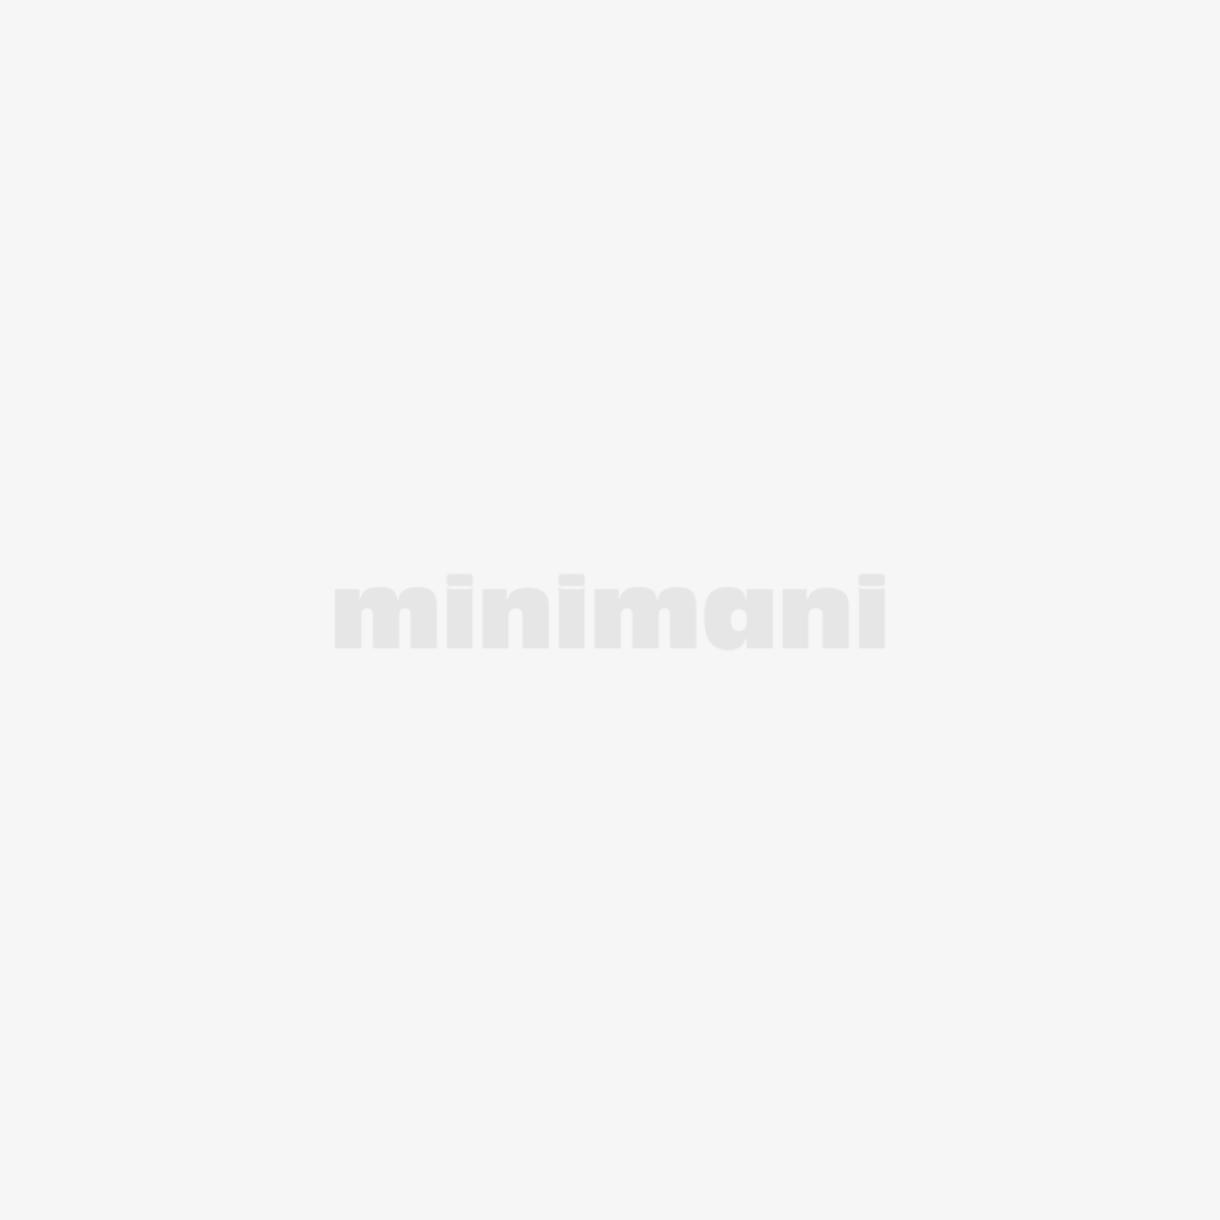 OPAL ANZ579 ASENNUSKAAPELI MK2,5 MUSTA 25M